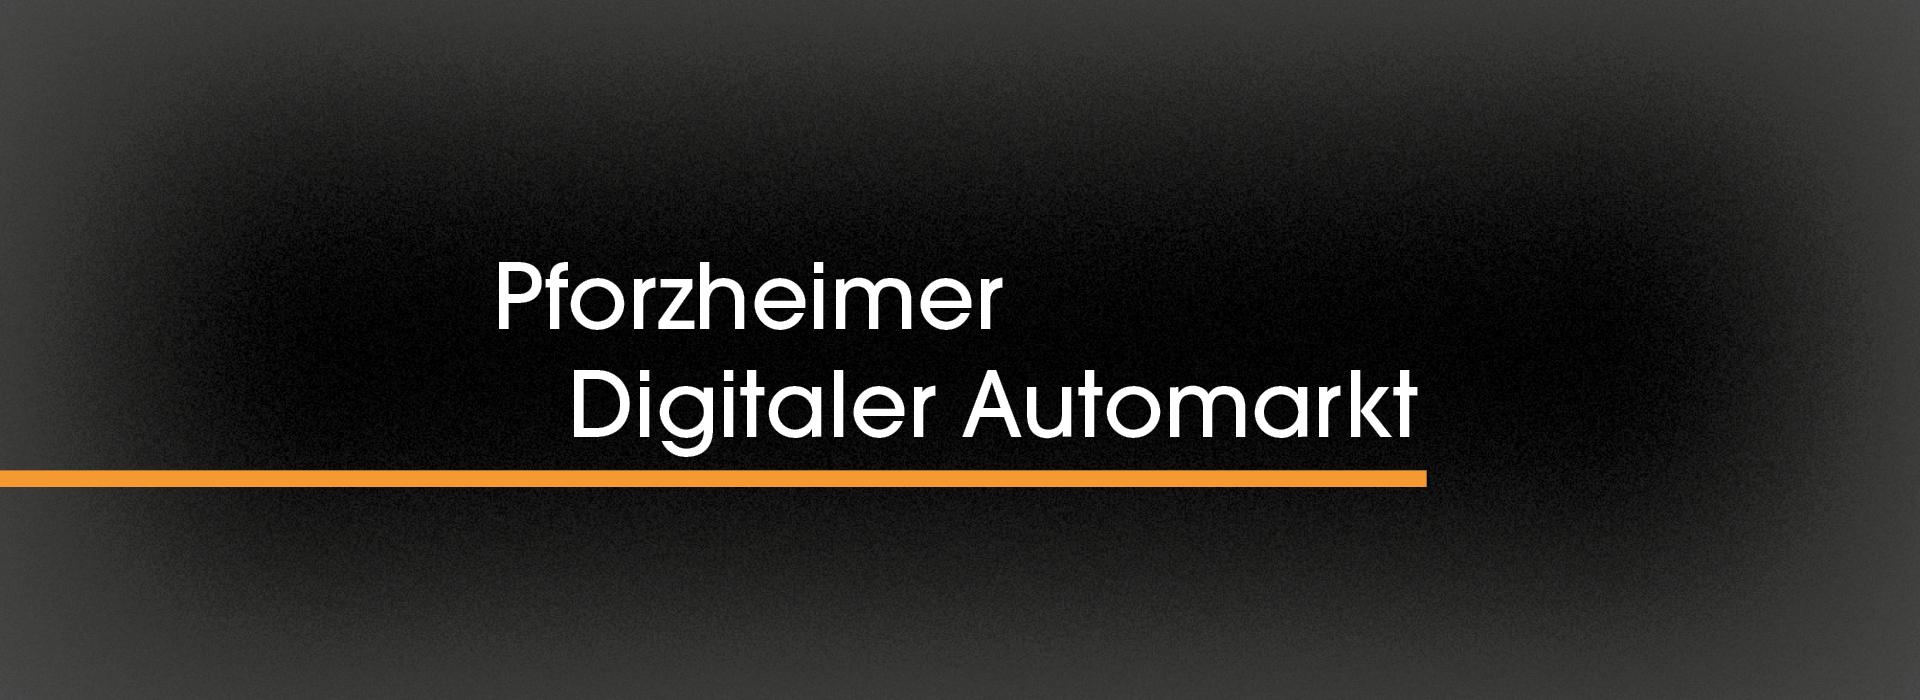 Pforzheimer Digitaler Automarkt